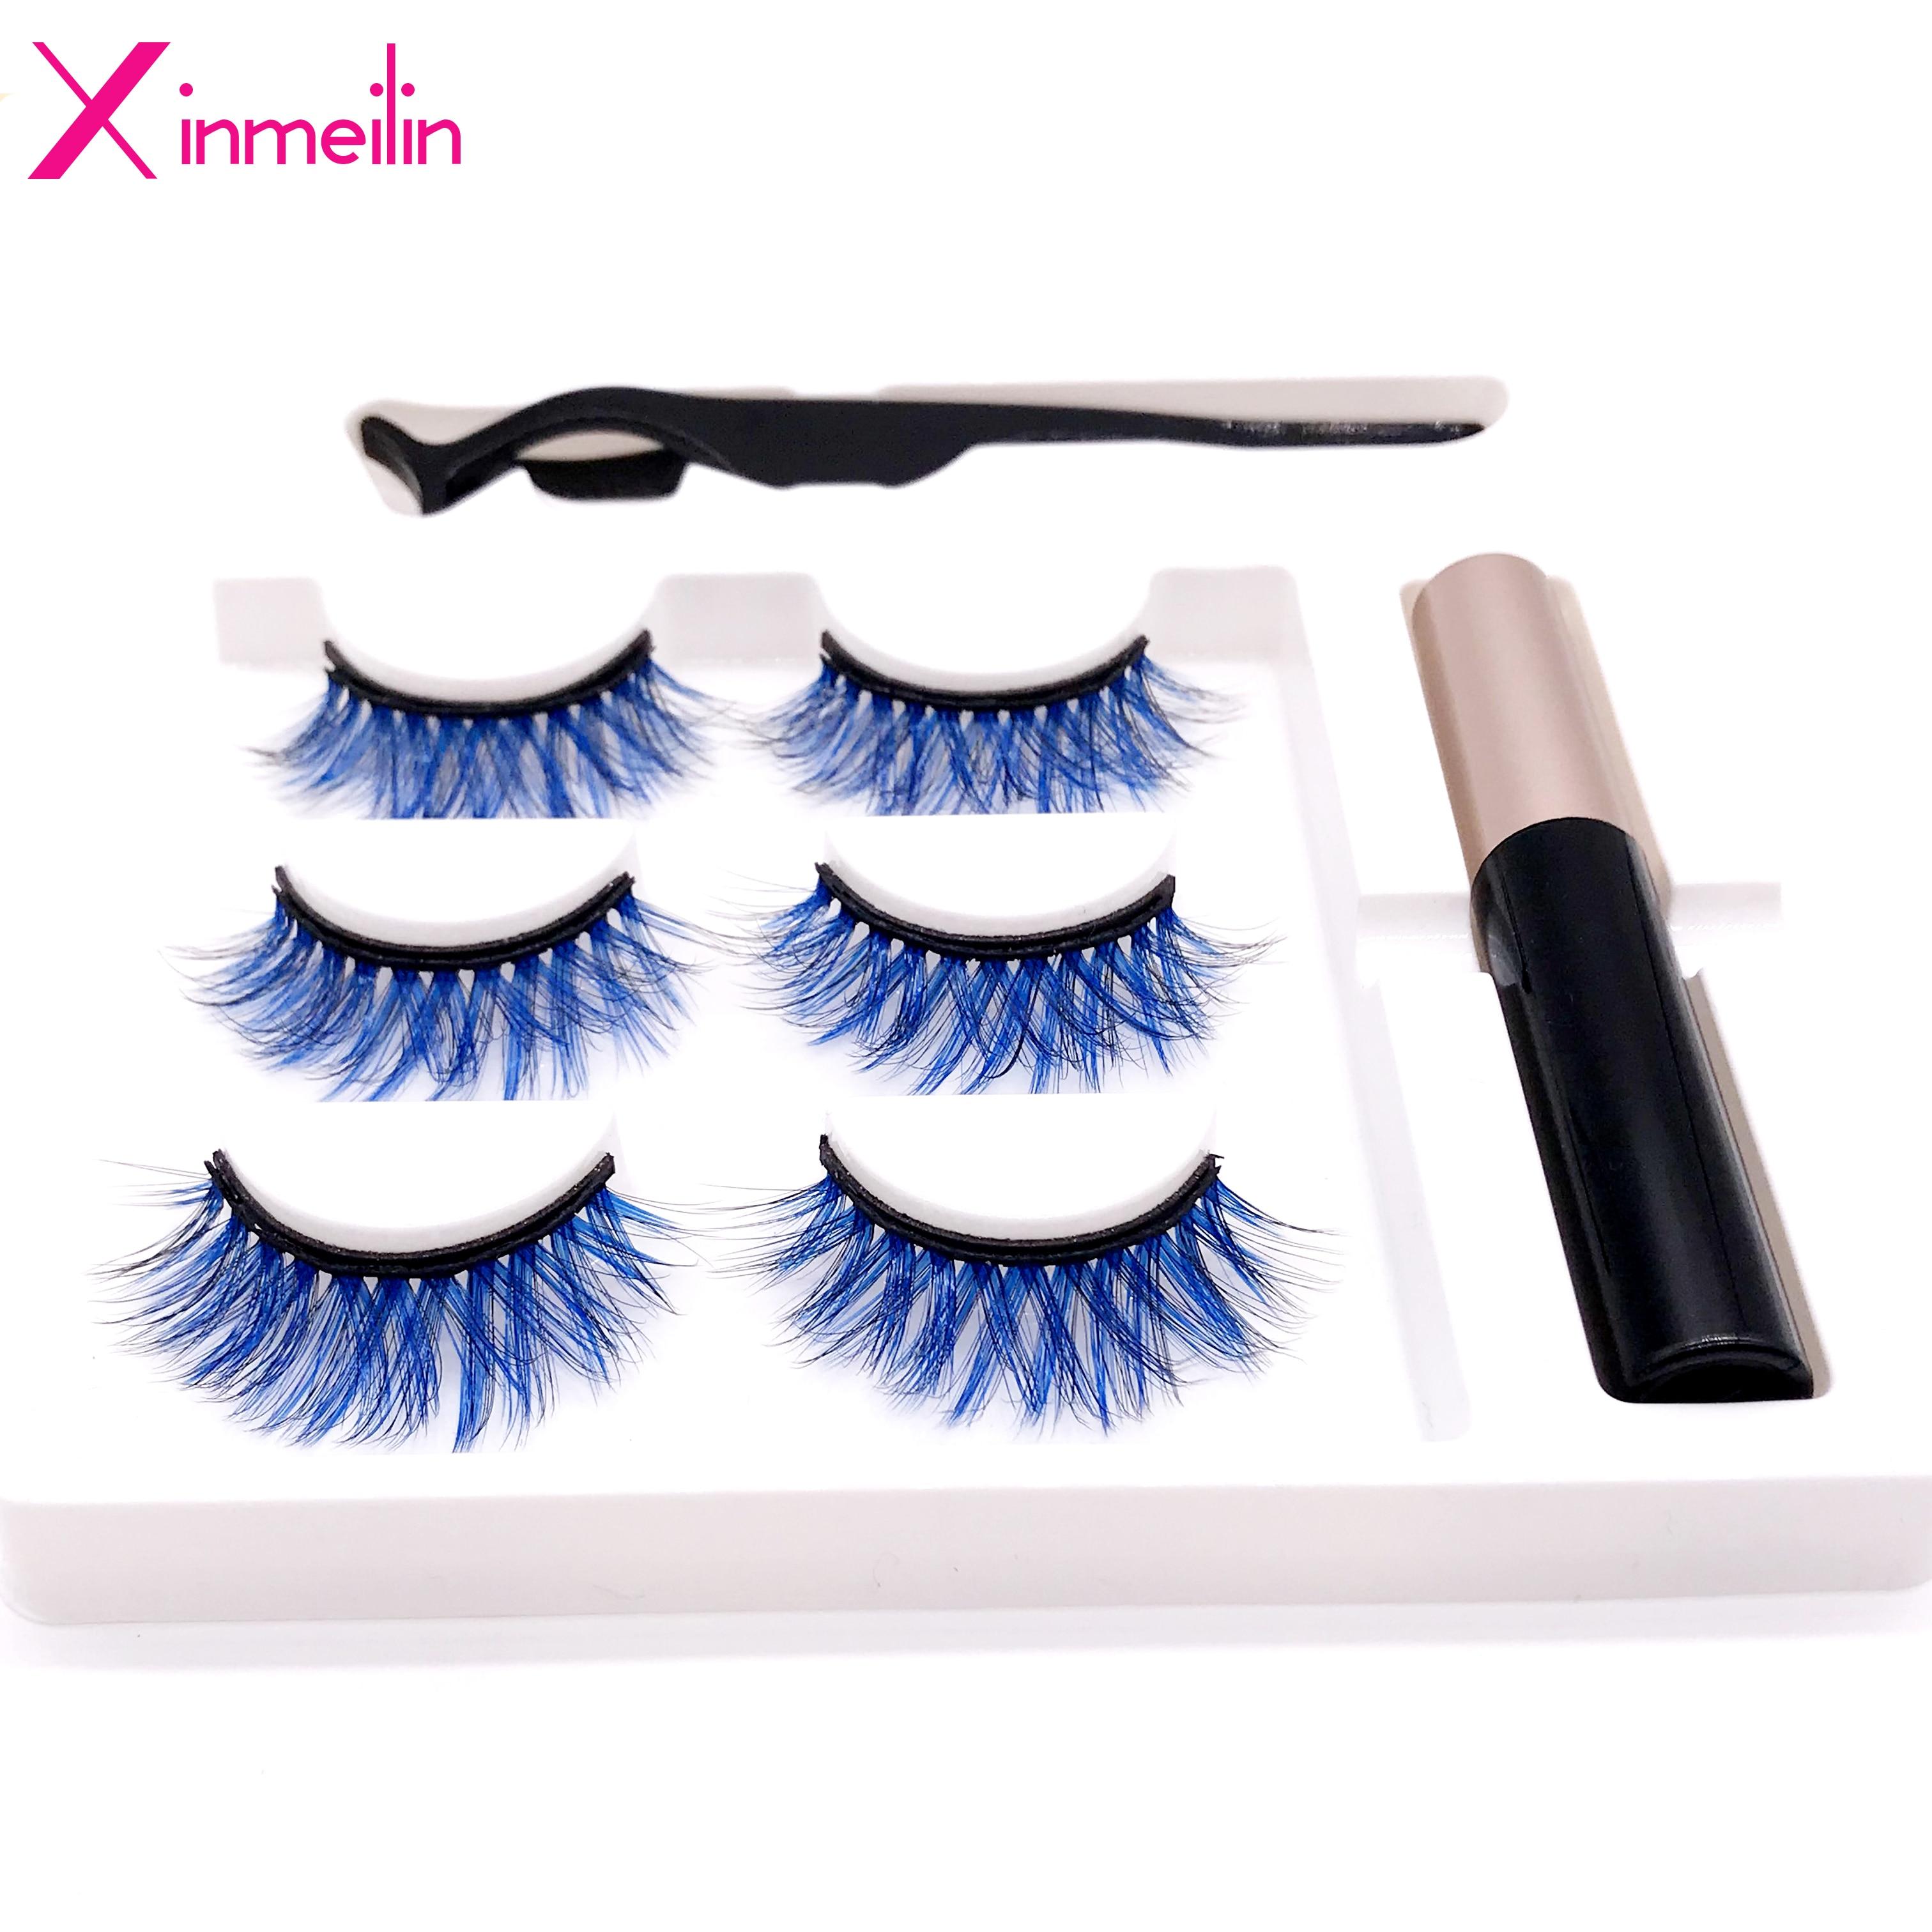 New 3D 3 Pairs Gradient Color Magnet Fake Eyelash Set Multicolor Optional Waterproof Long Lasting Magnetic Eyelash Extension Kit